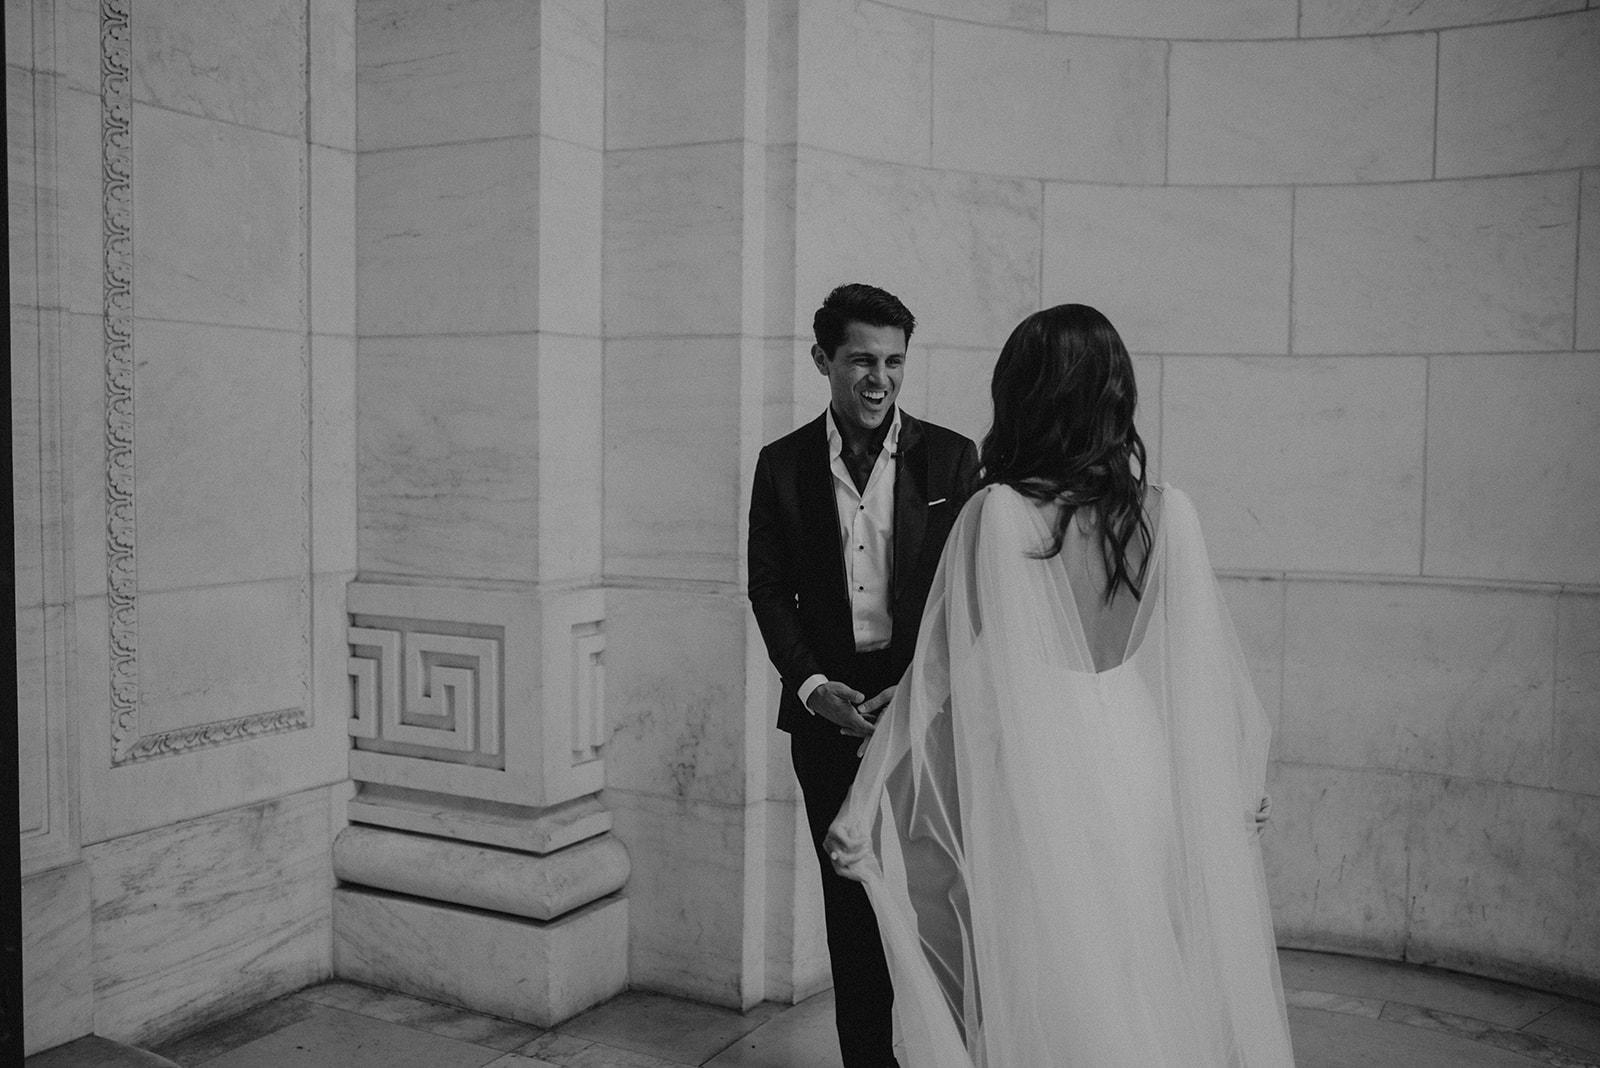 Jenna___Austin_Wedding_Day-_LHP-321.jpg